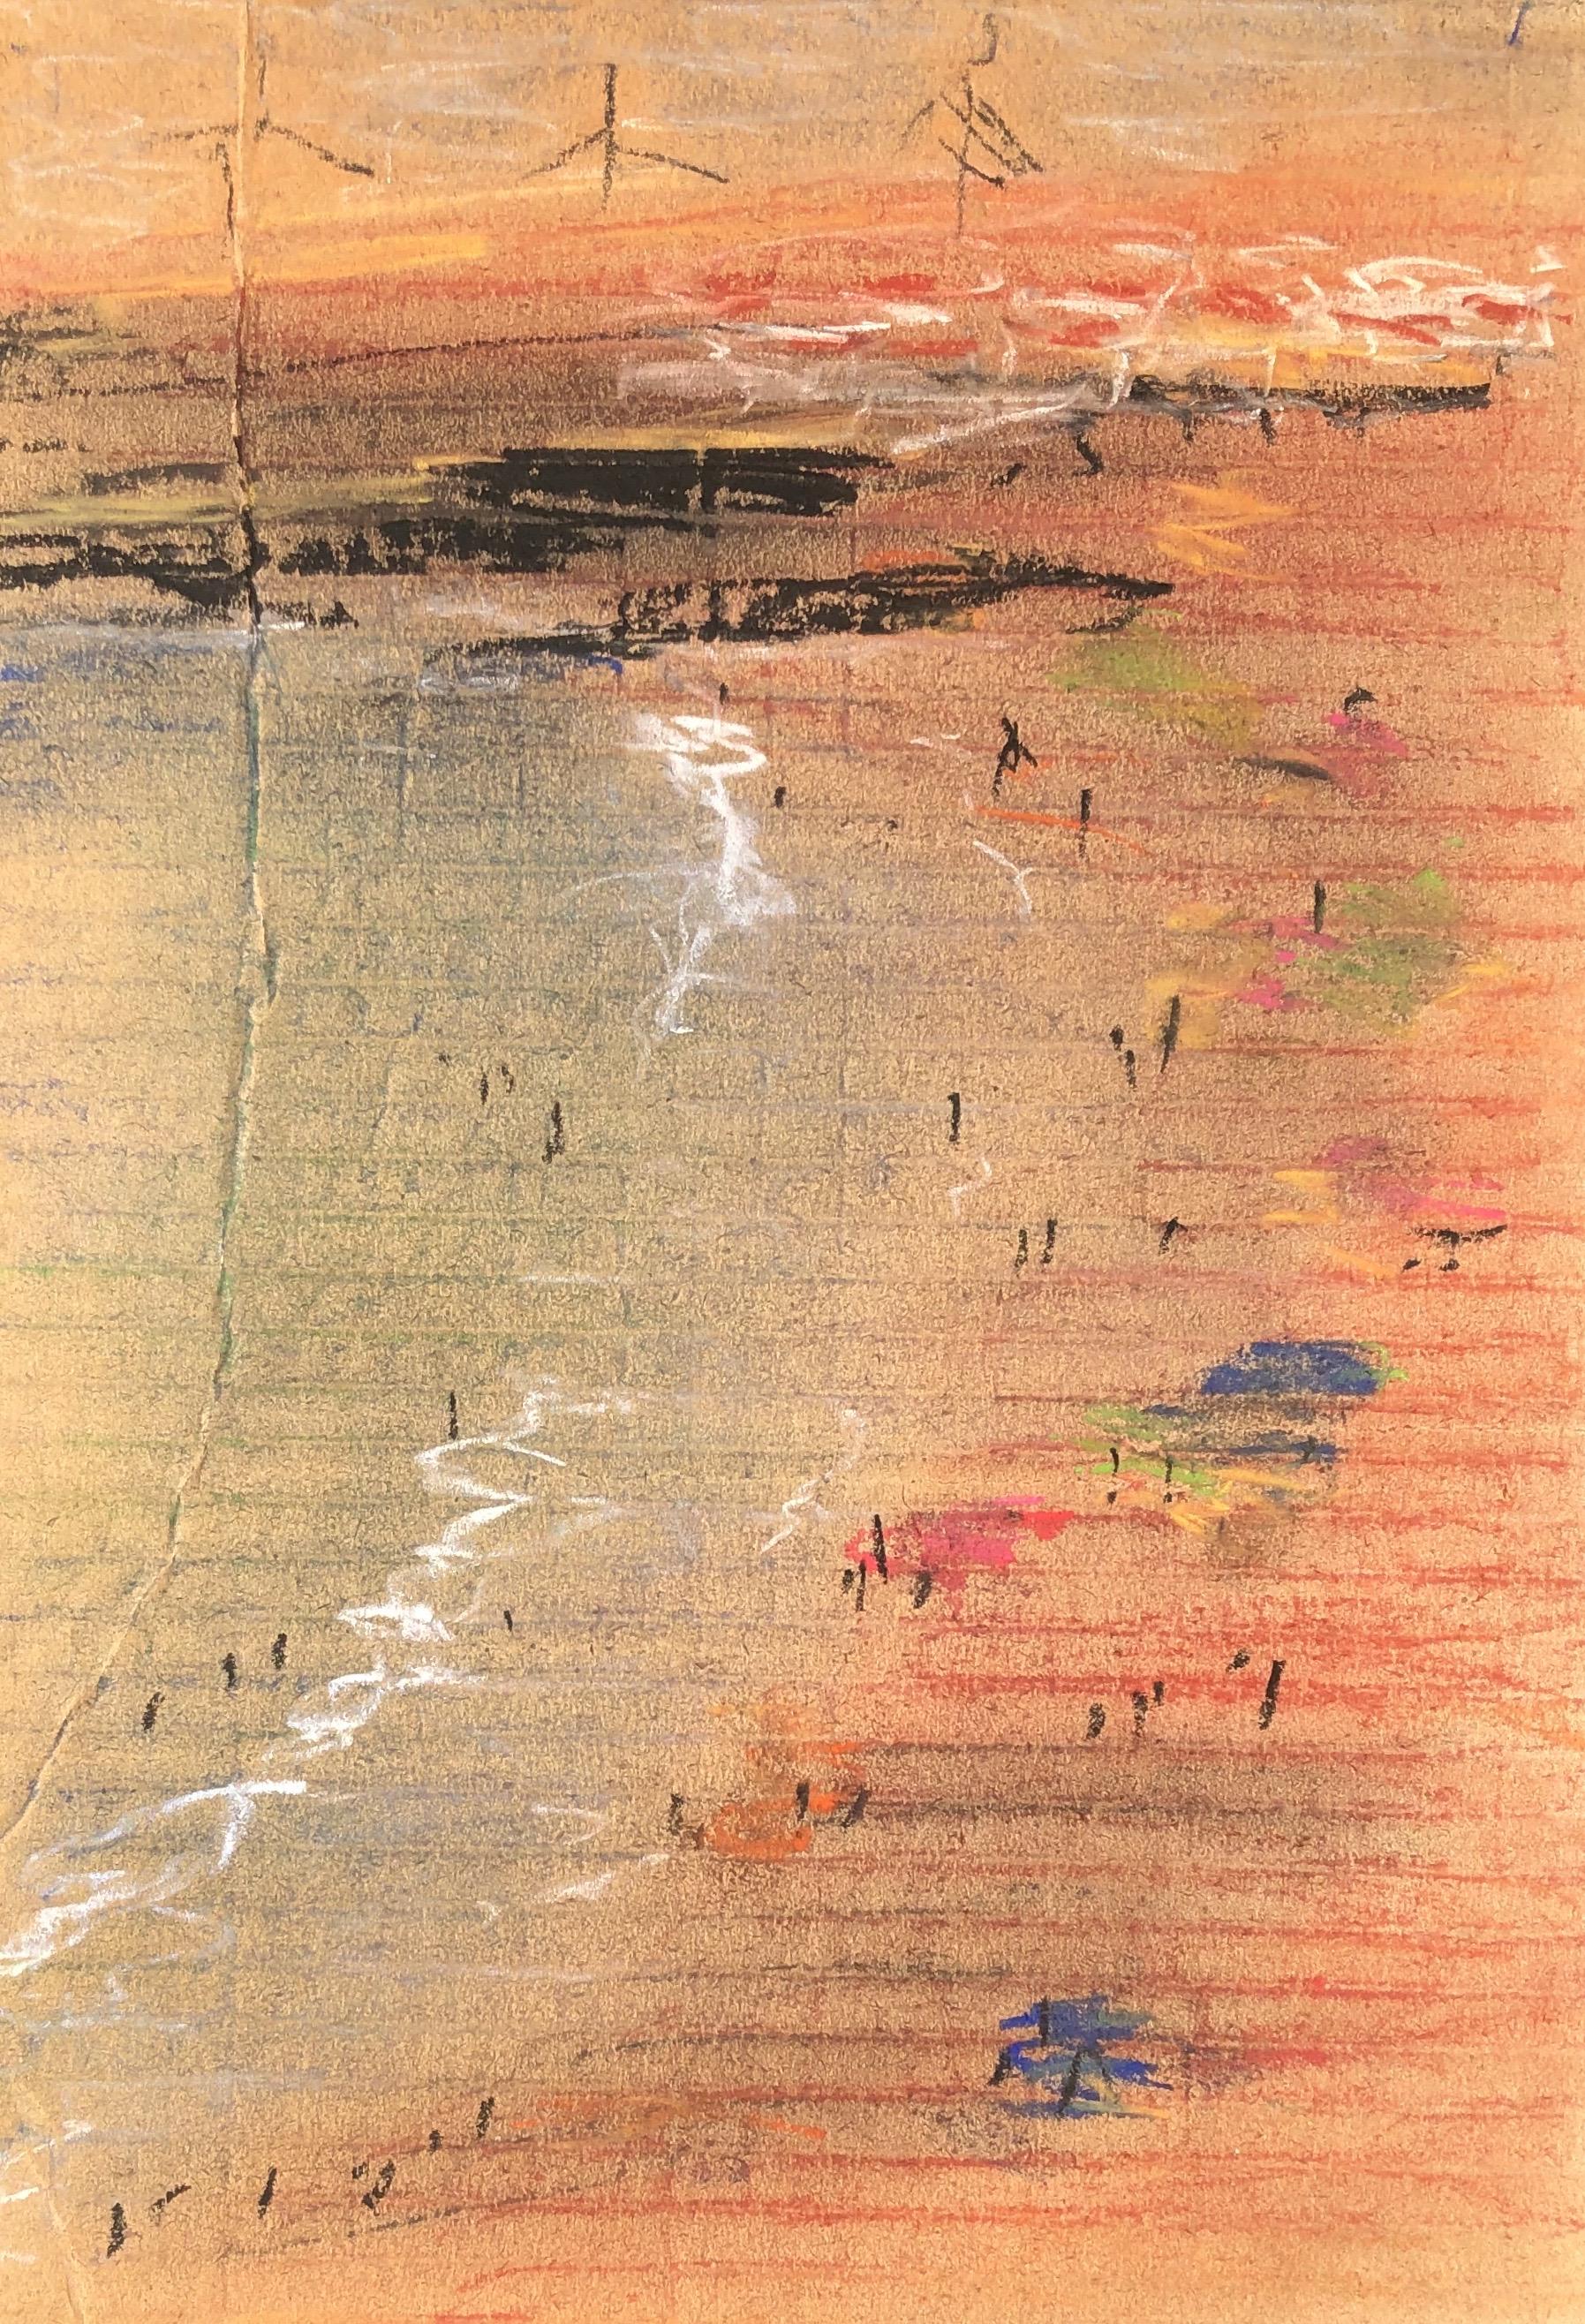 playa de tenerife 1